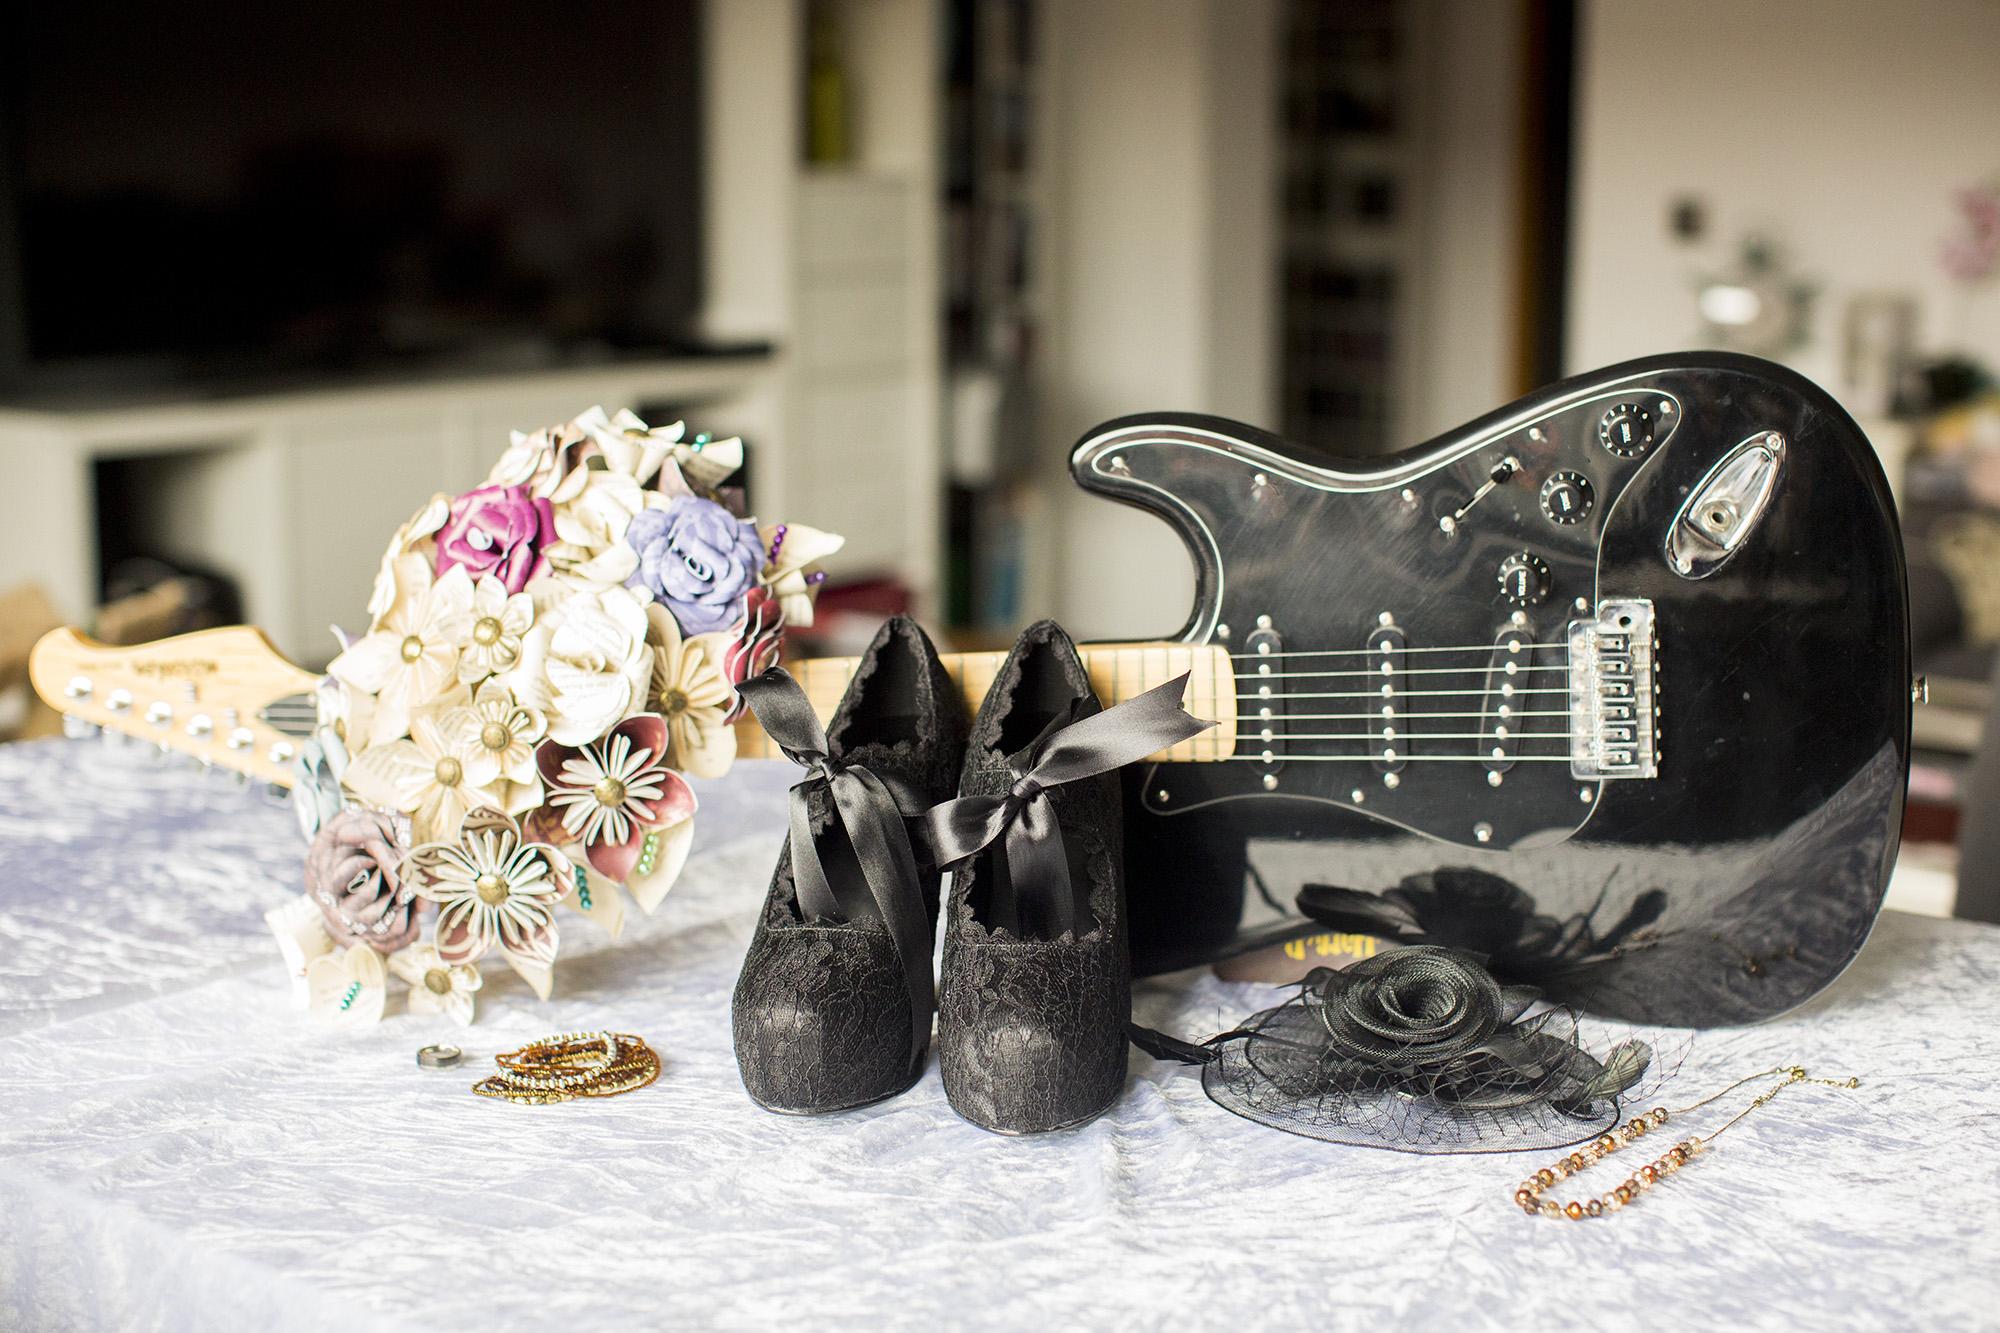 Seriously_Sabrina_Photography_Essen_Germany_RocknRoll_Hochzeit_Wedding_PatrickJenny4.jpg